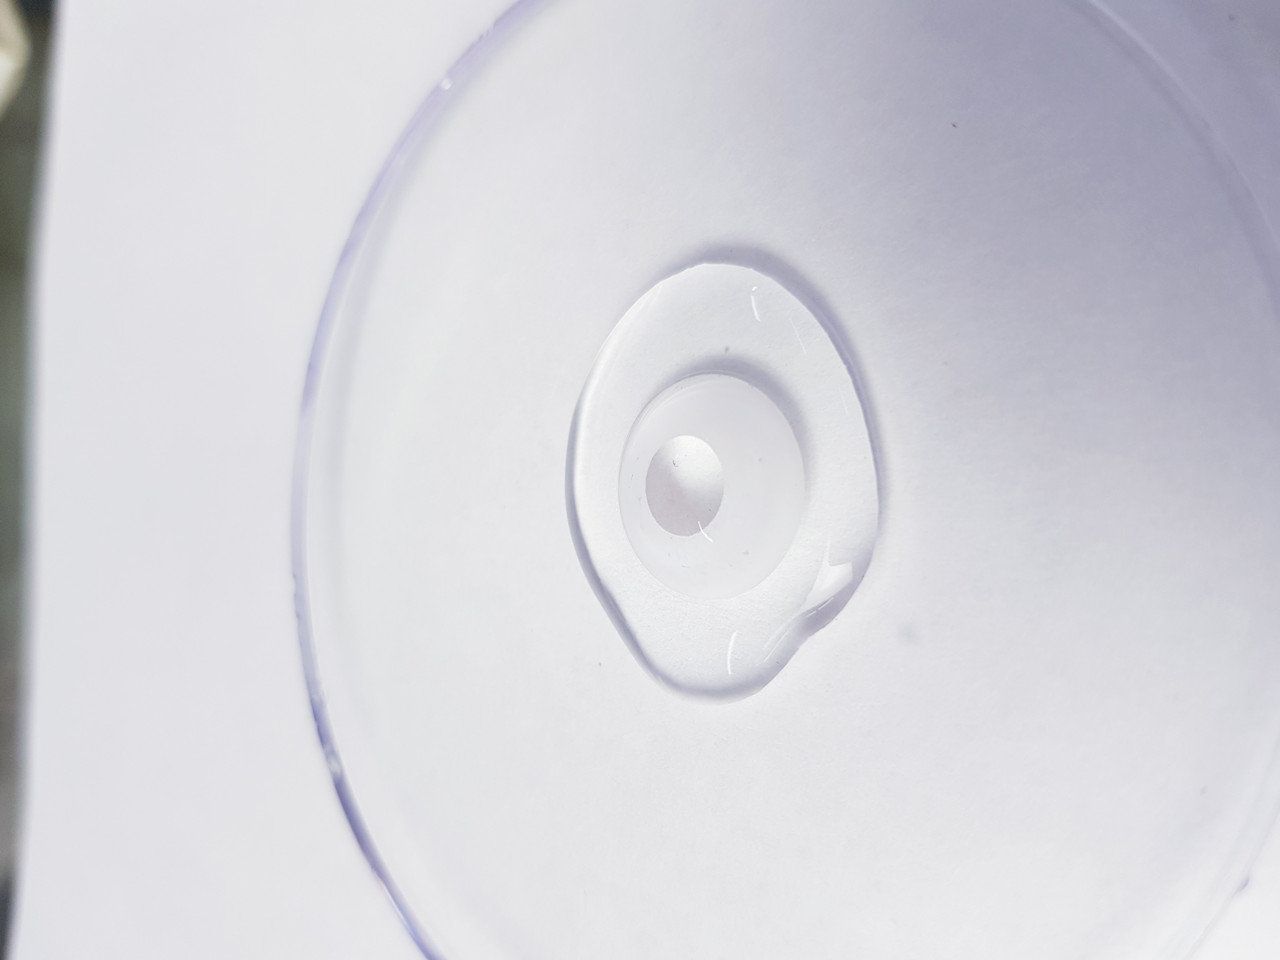 Контактные линзы Dox F50 White Out - фото 2